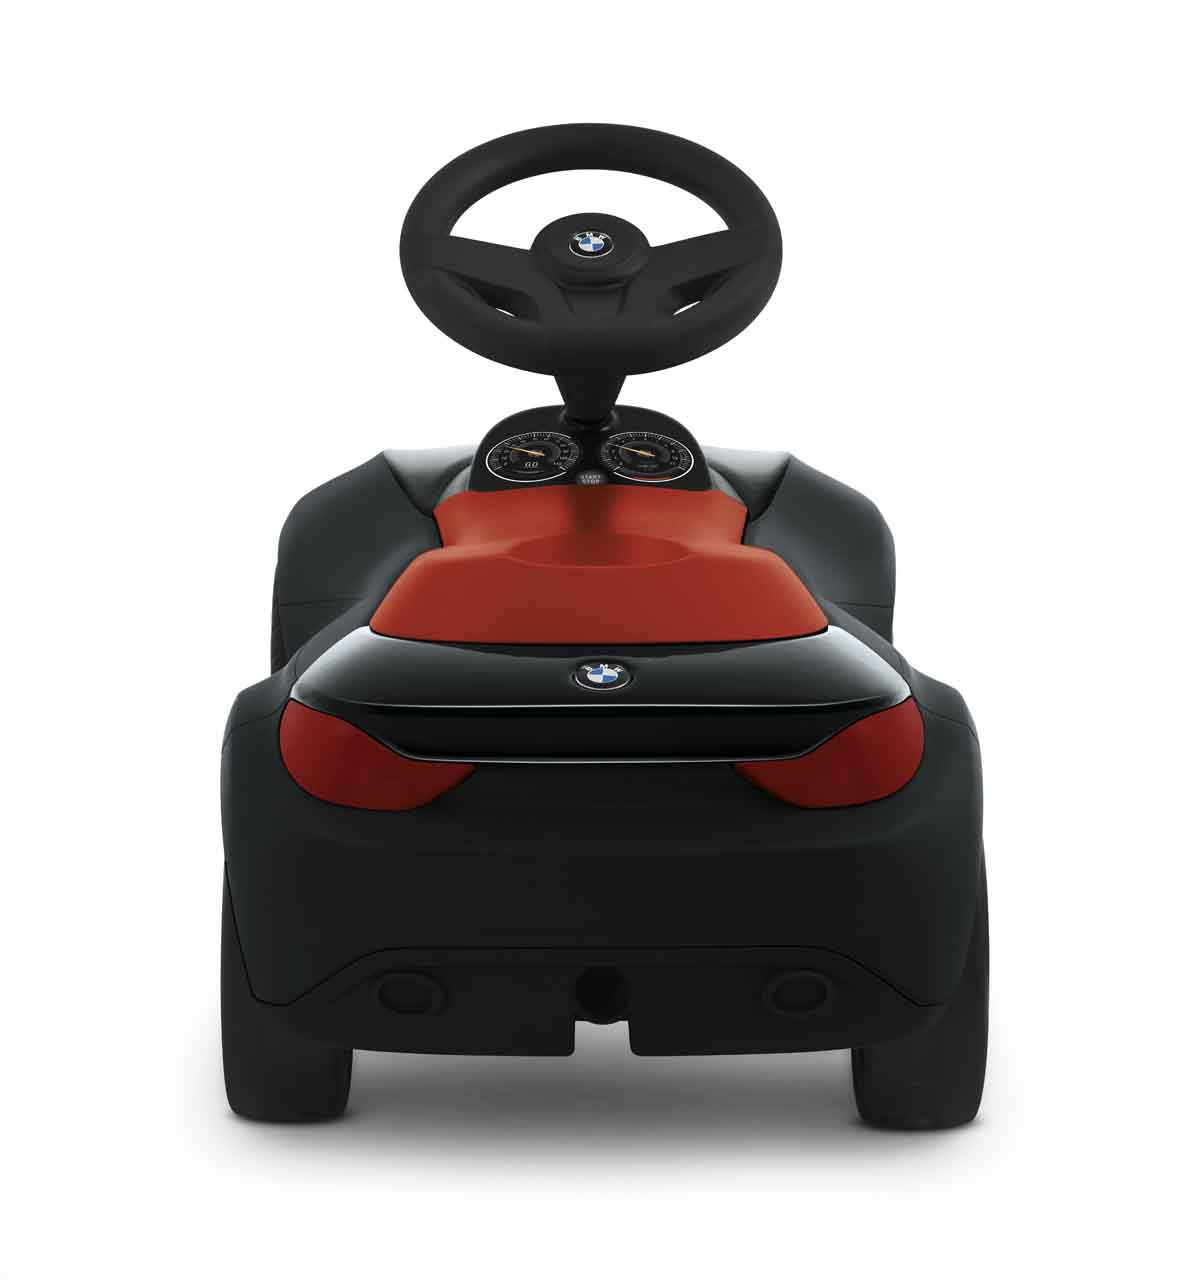 BMW Baby Racer III, Zwart / Oranje: https://bmwshop.ekris.nl/nl/lifestyle/kinderspeelgoed/80932413782...